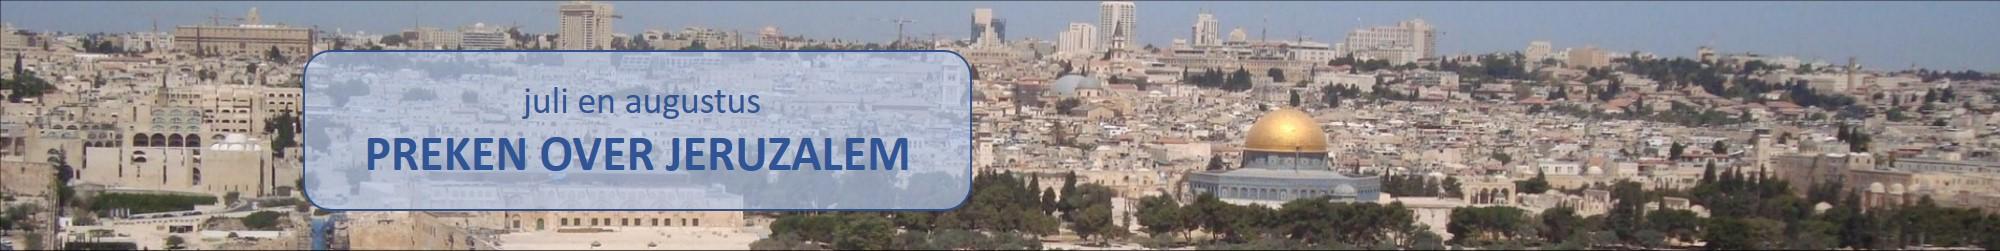 PREKEN OVER JERUZALEM